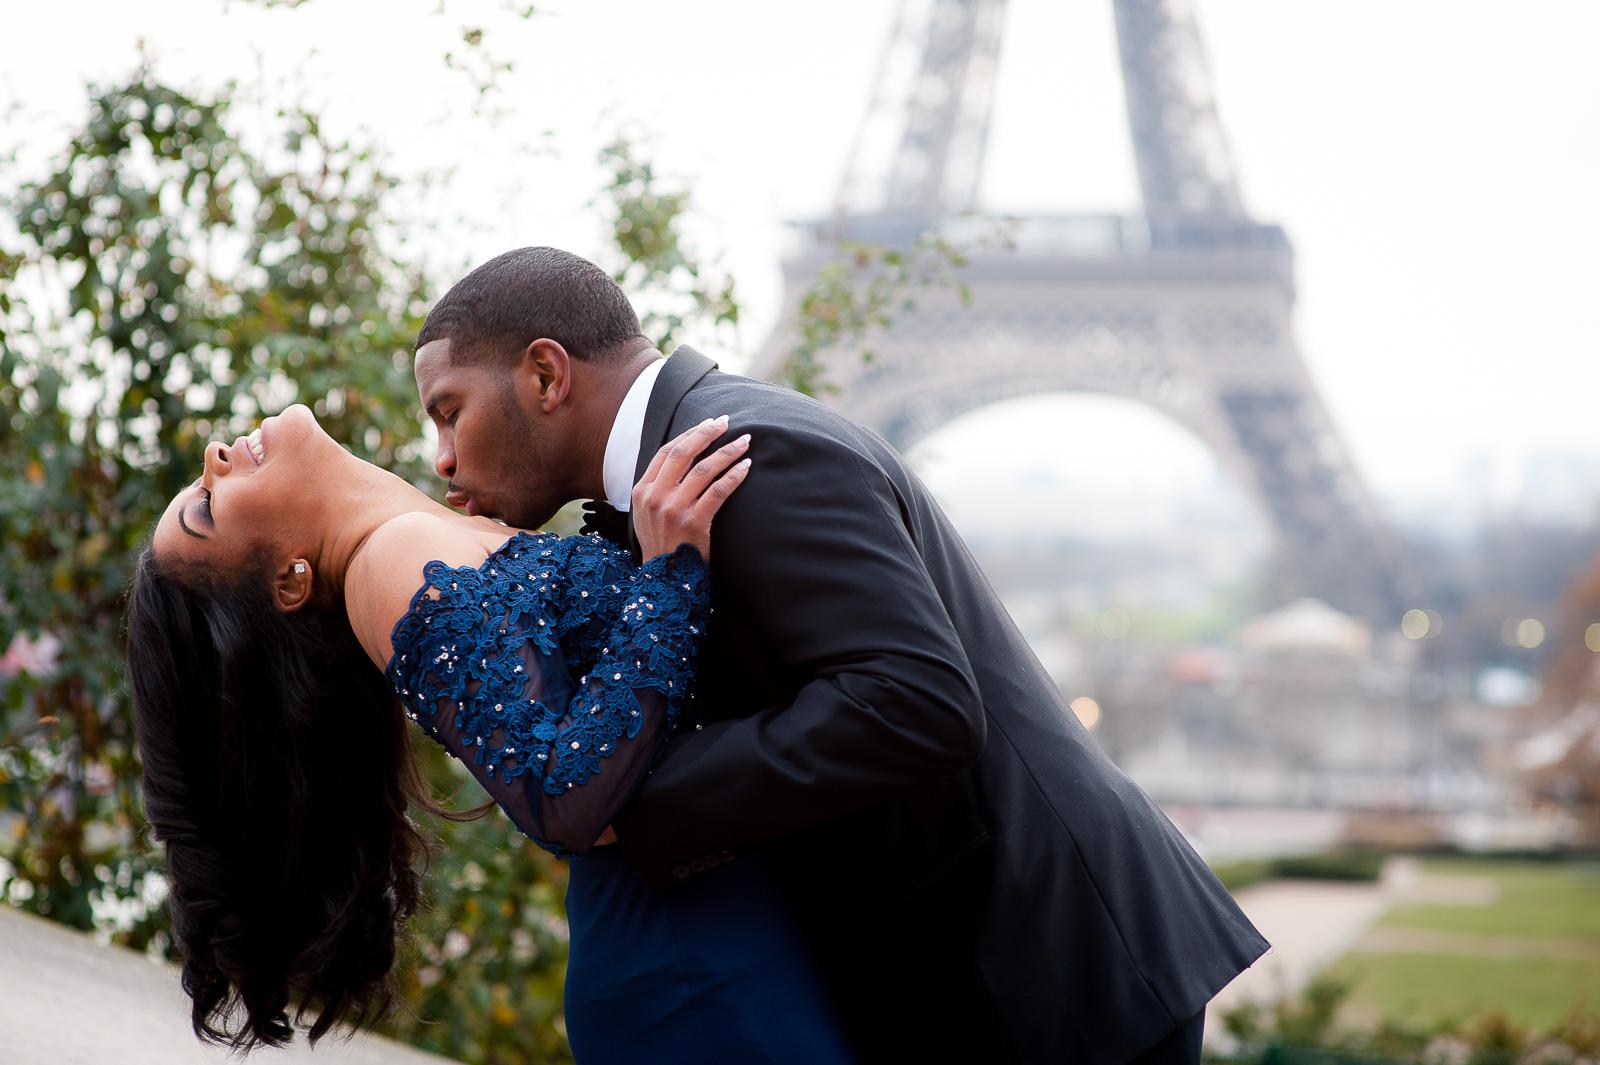 engagement photoshoot in paris